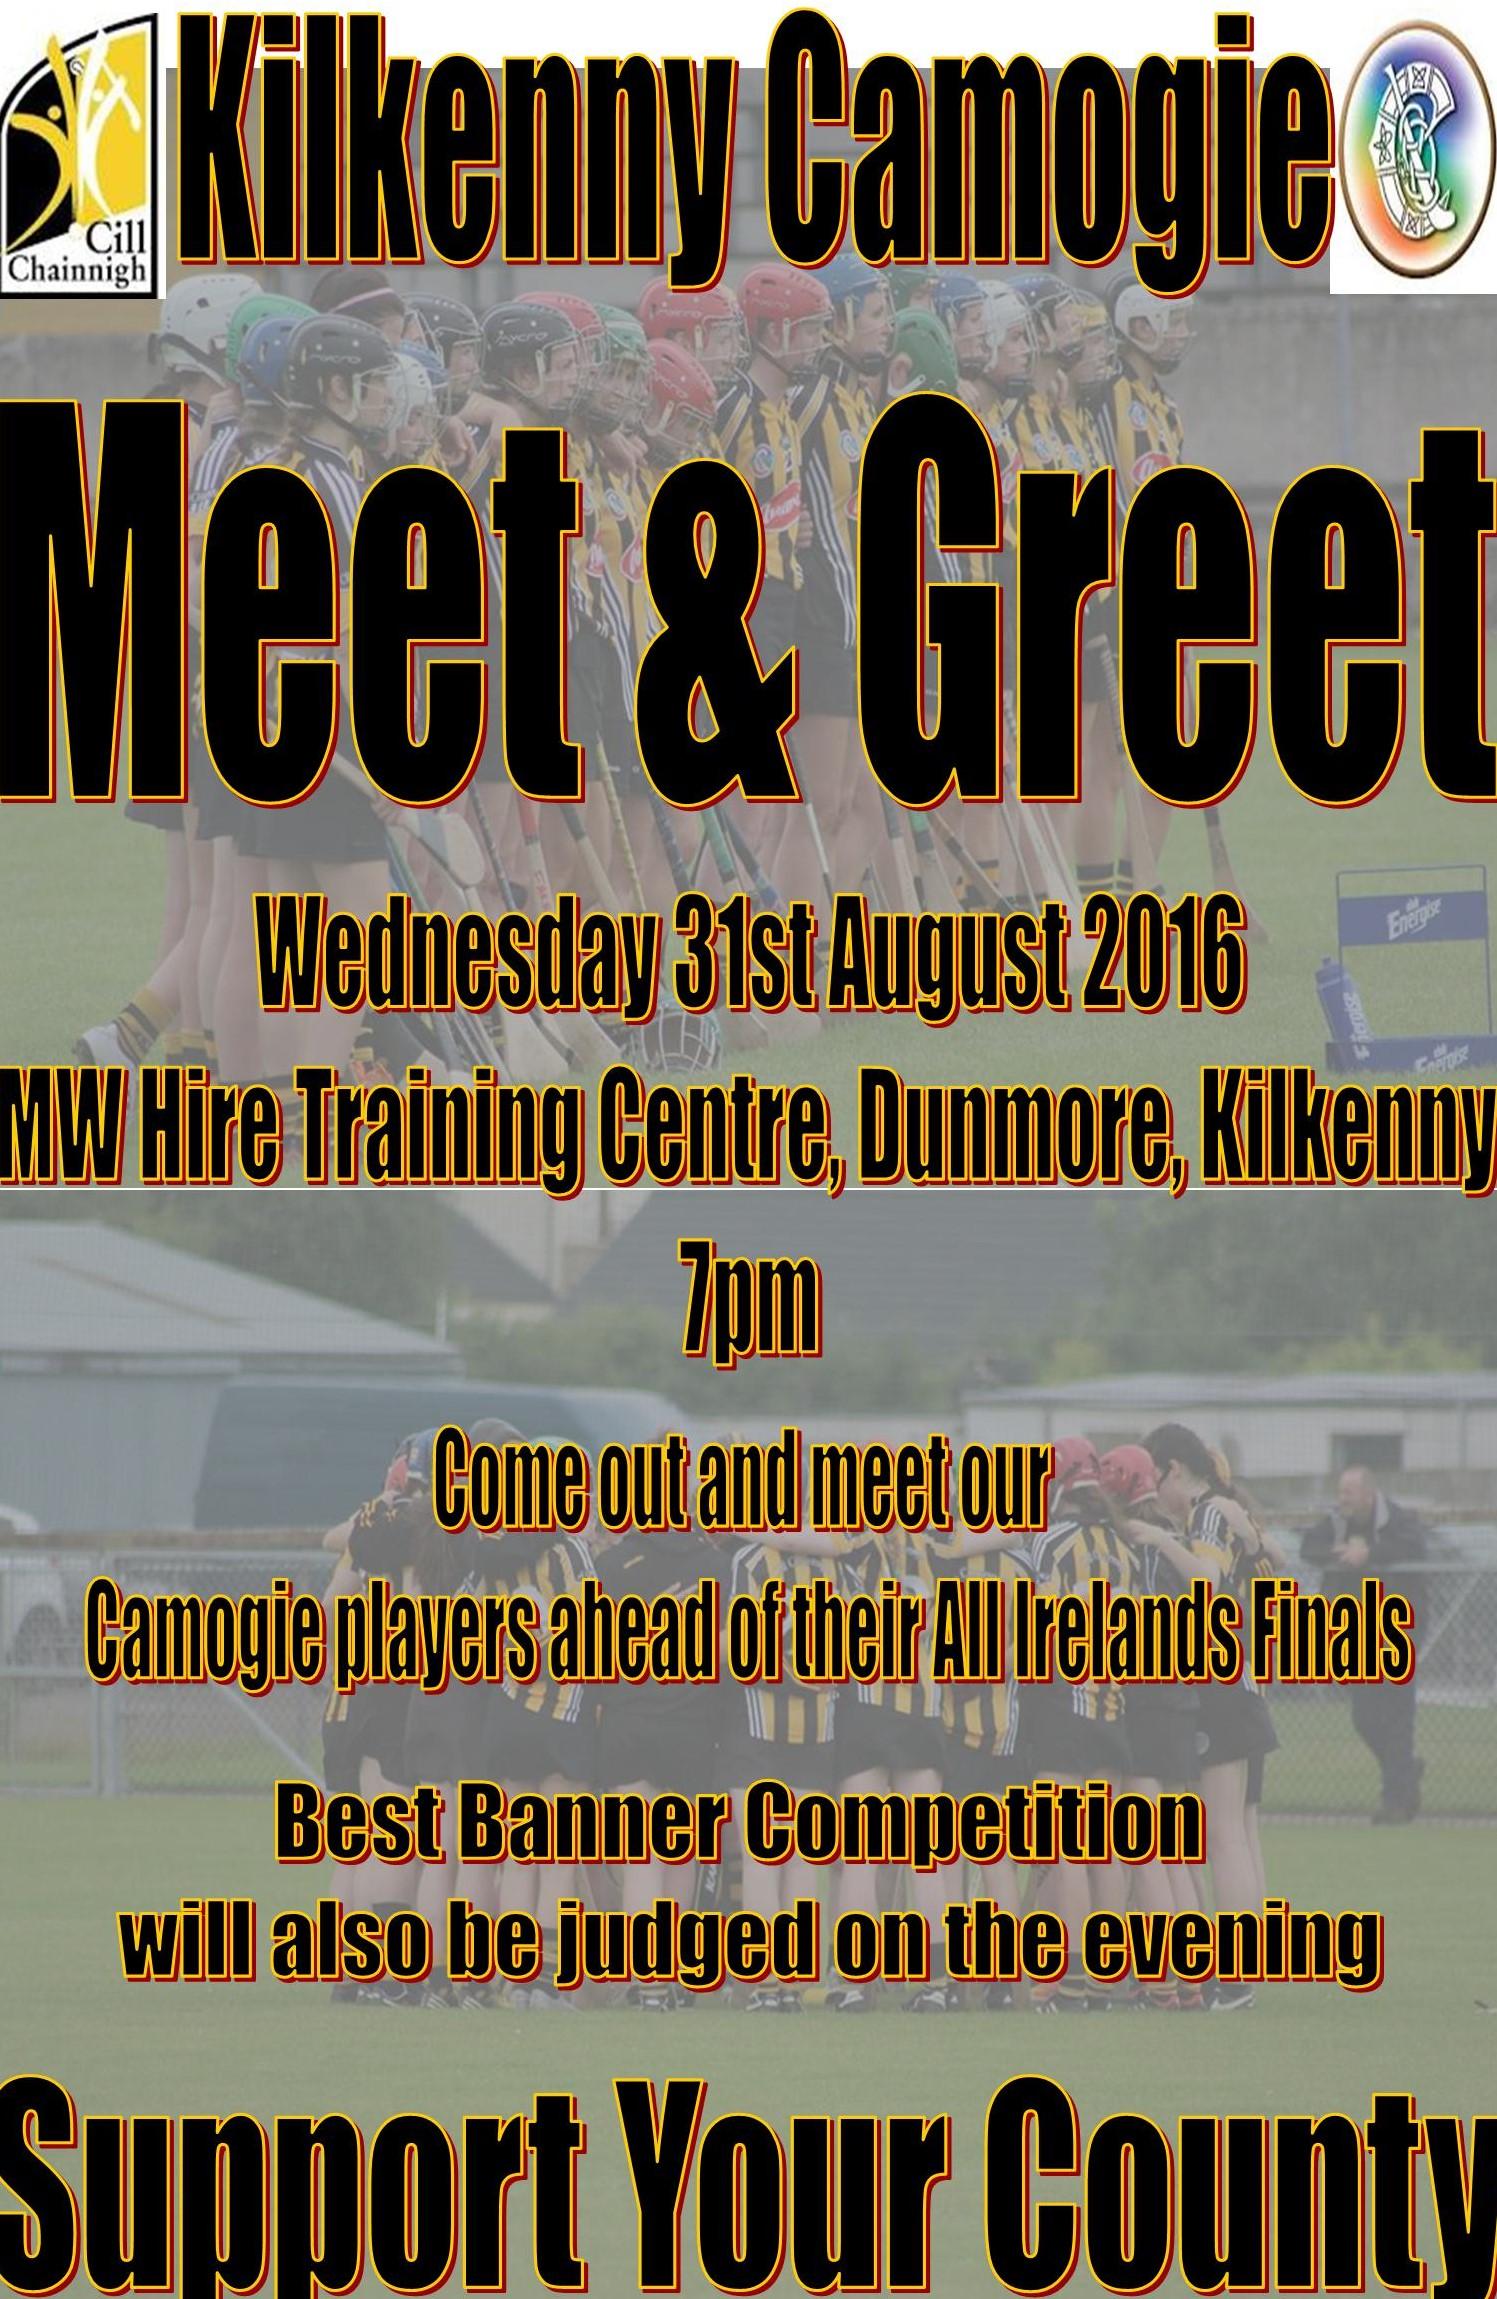 Kilkenny Camogie Meet and Greet